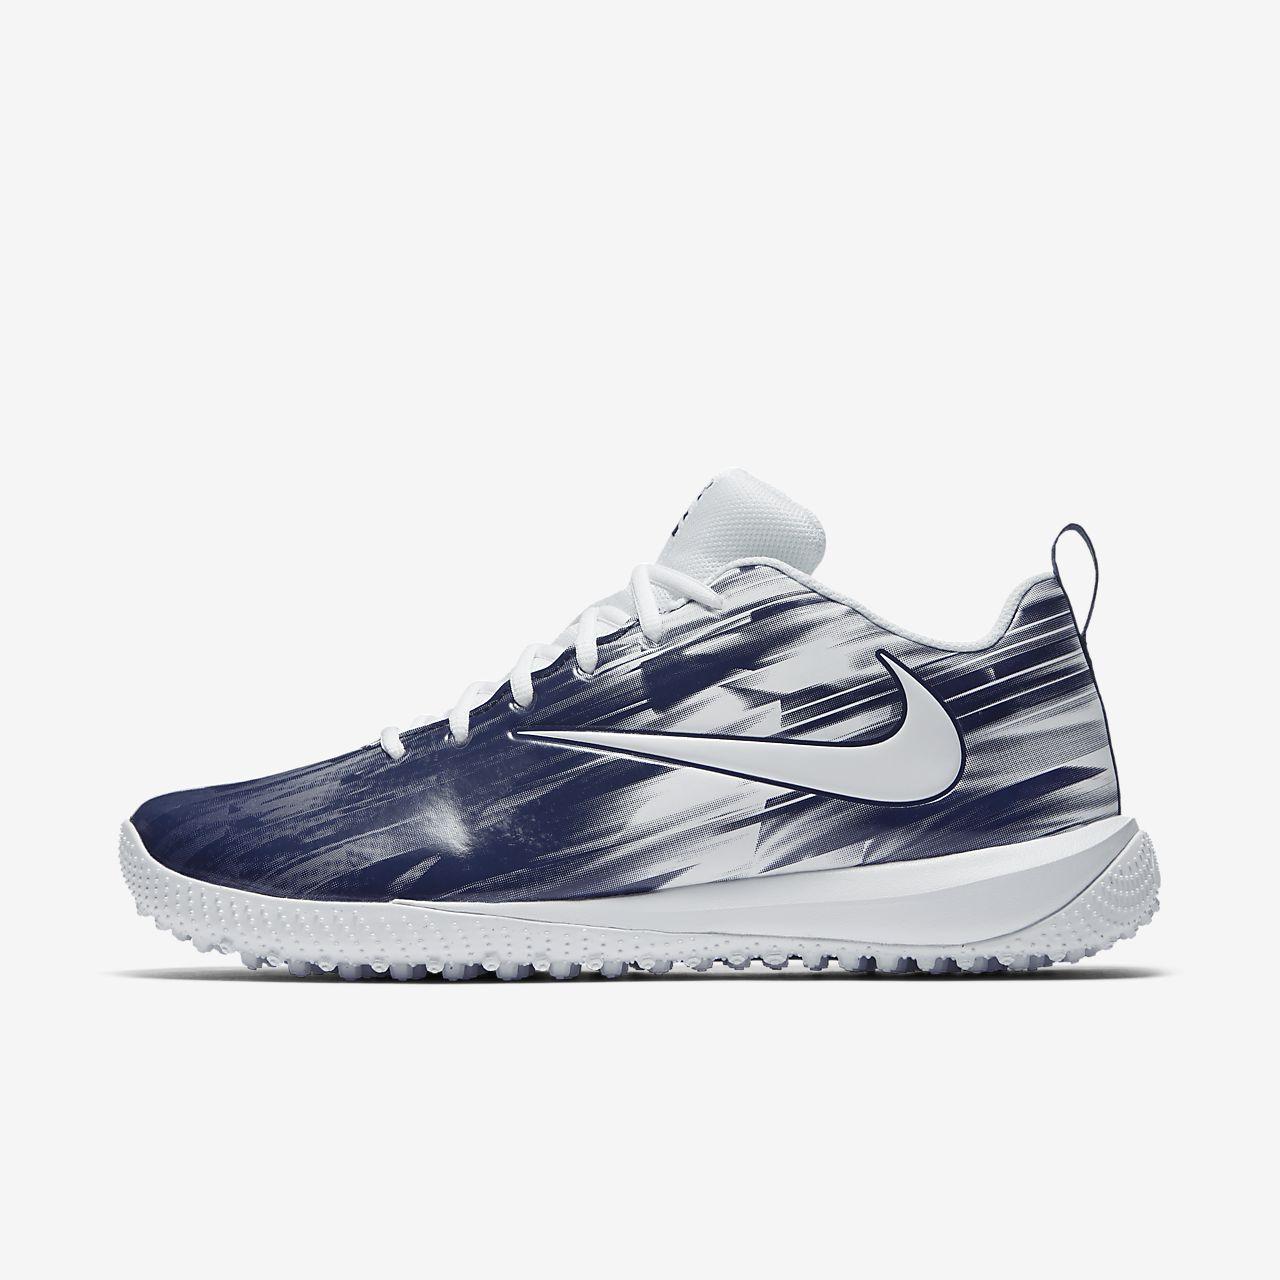 Nike Vapor Turf Shoes